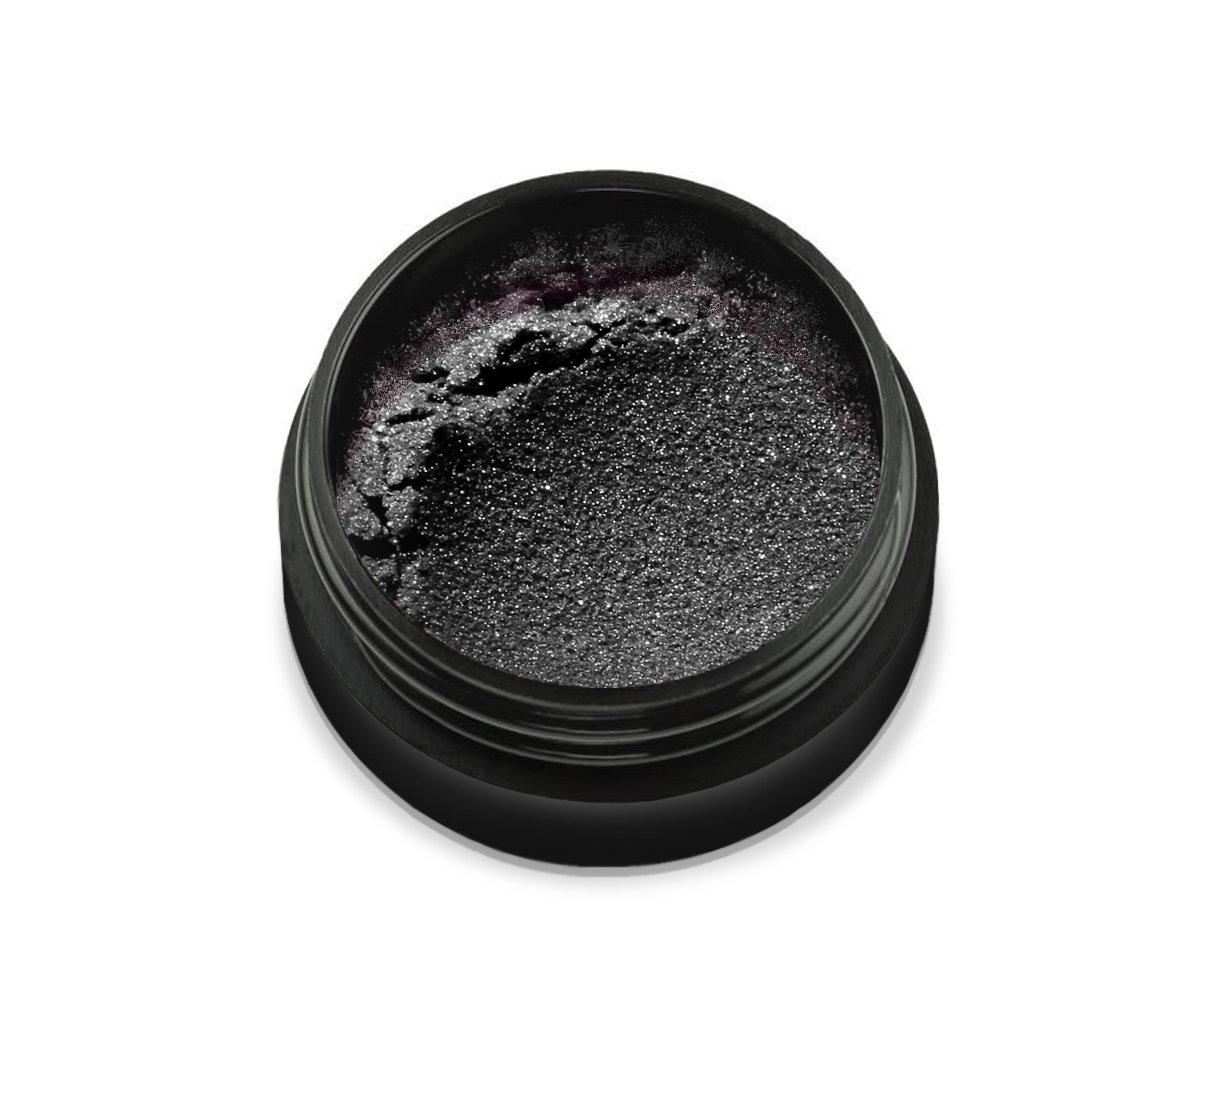 "66K1 Pudra cu pigmenti 'Didier Lab"", silver black 2,5g/Pigment powder 'Didier Lab"", silver black"